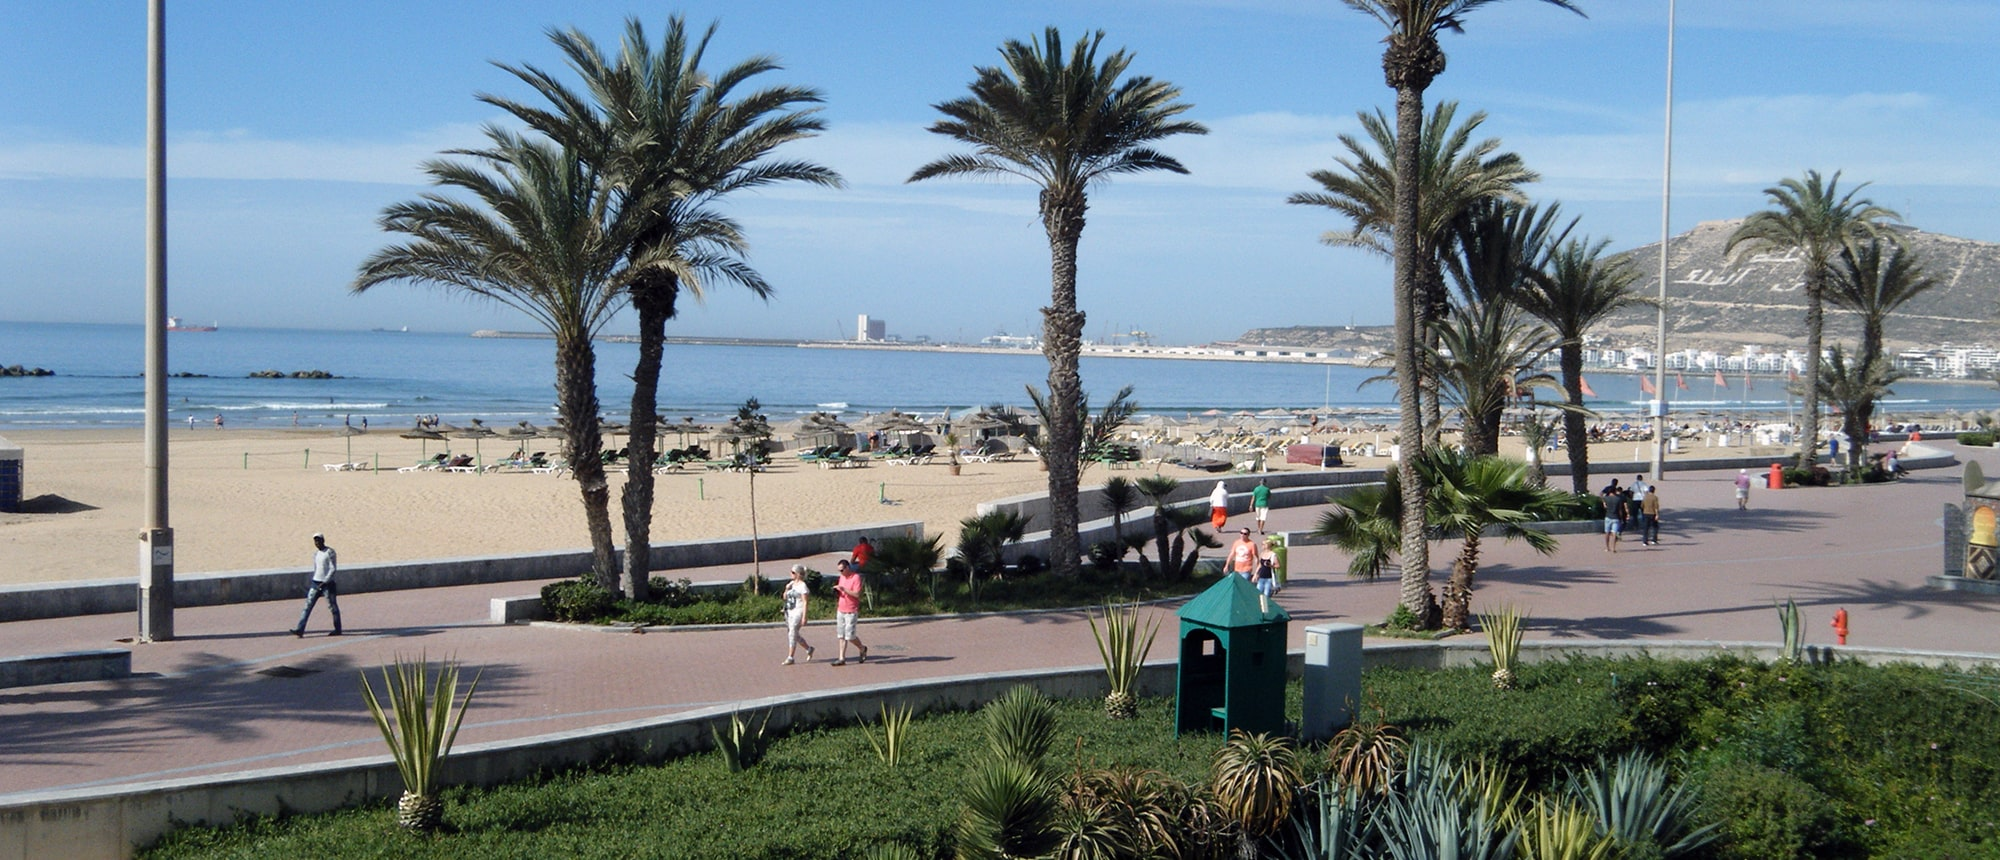 Marokko-Promenade-dp-min